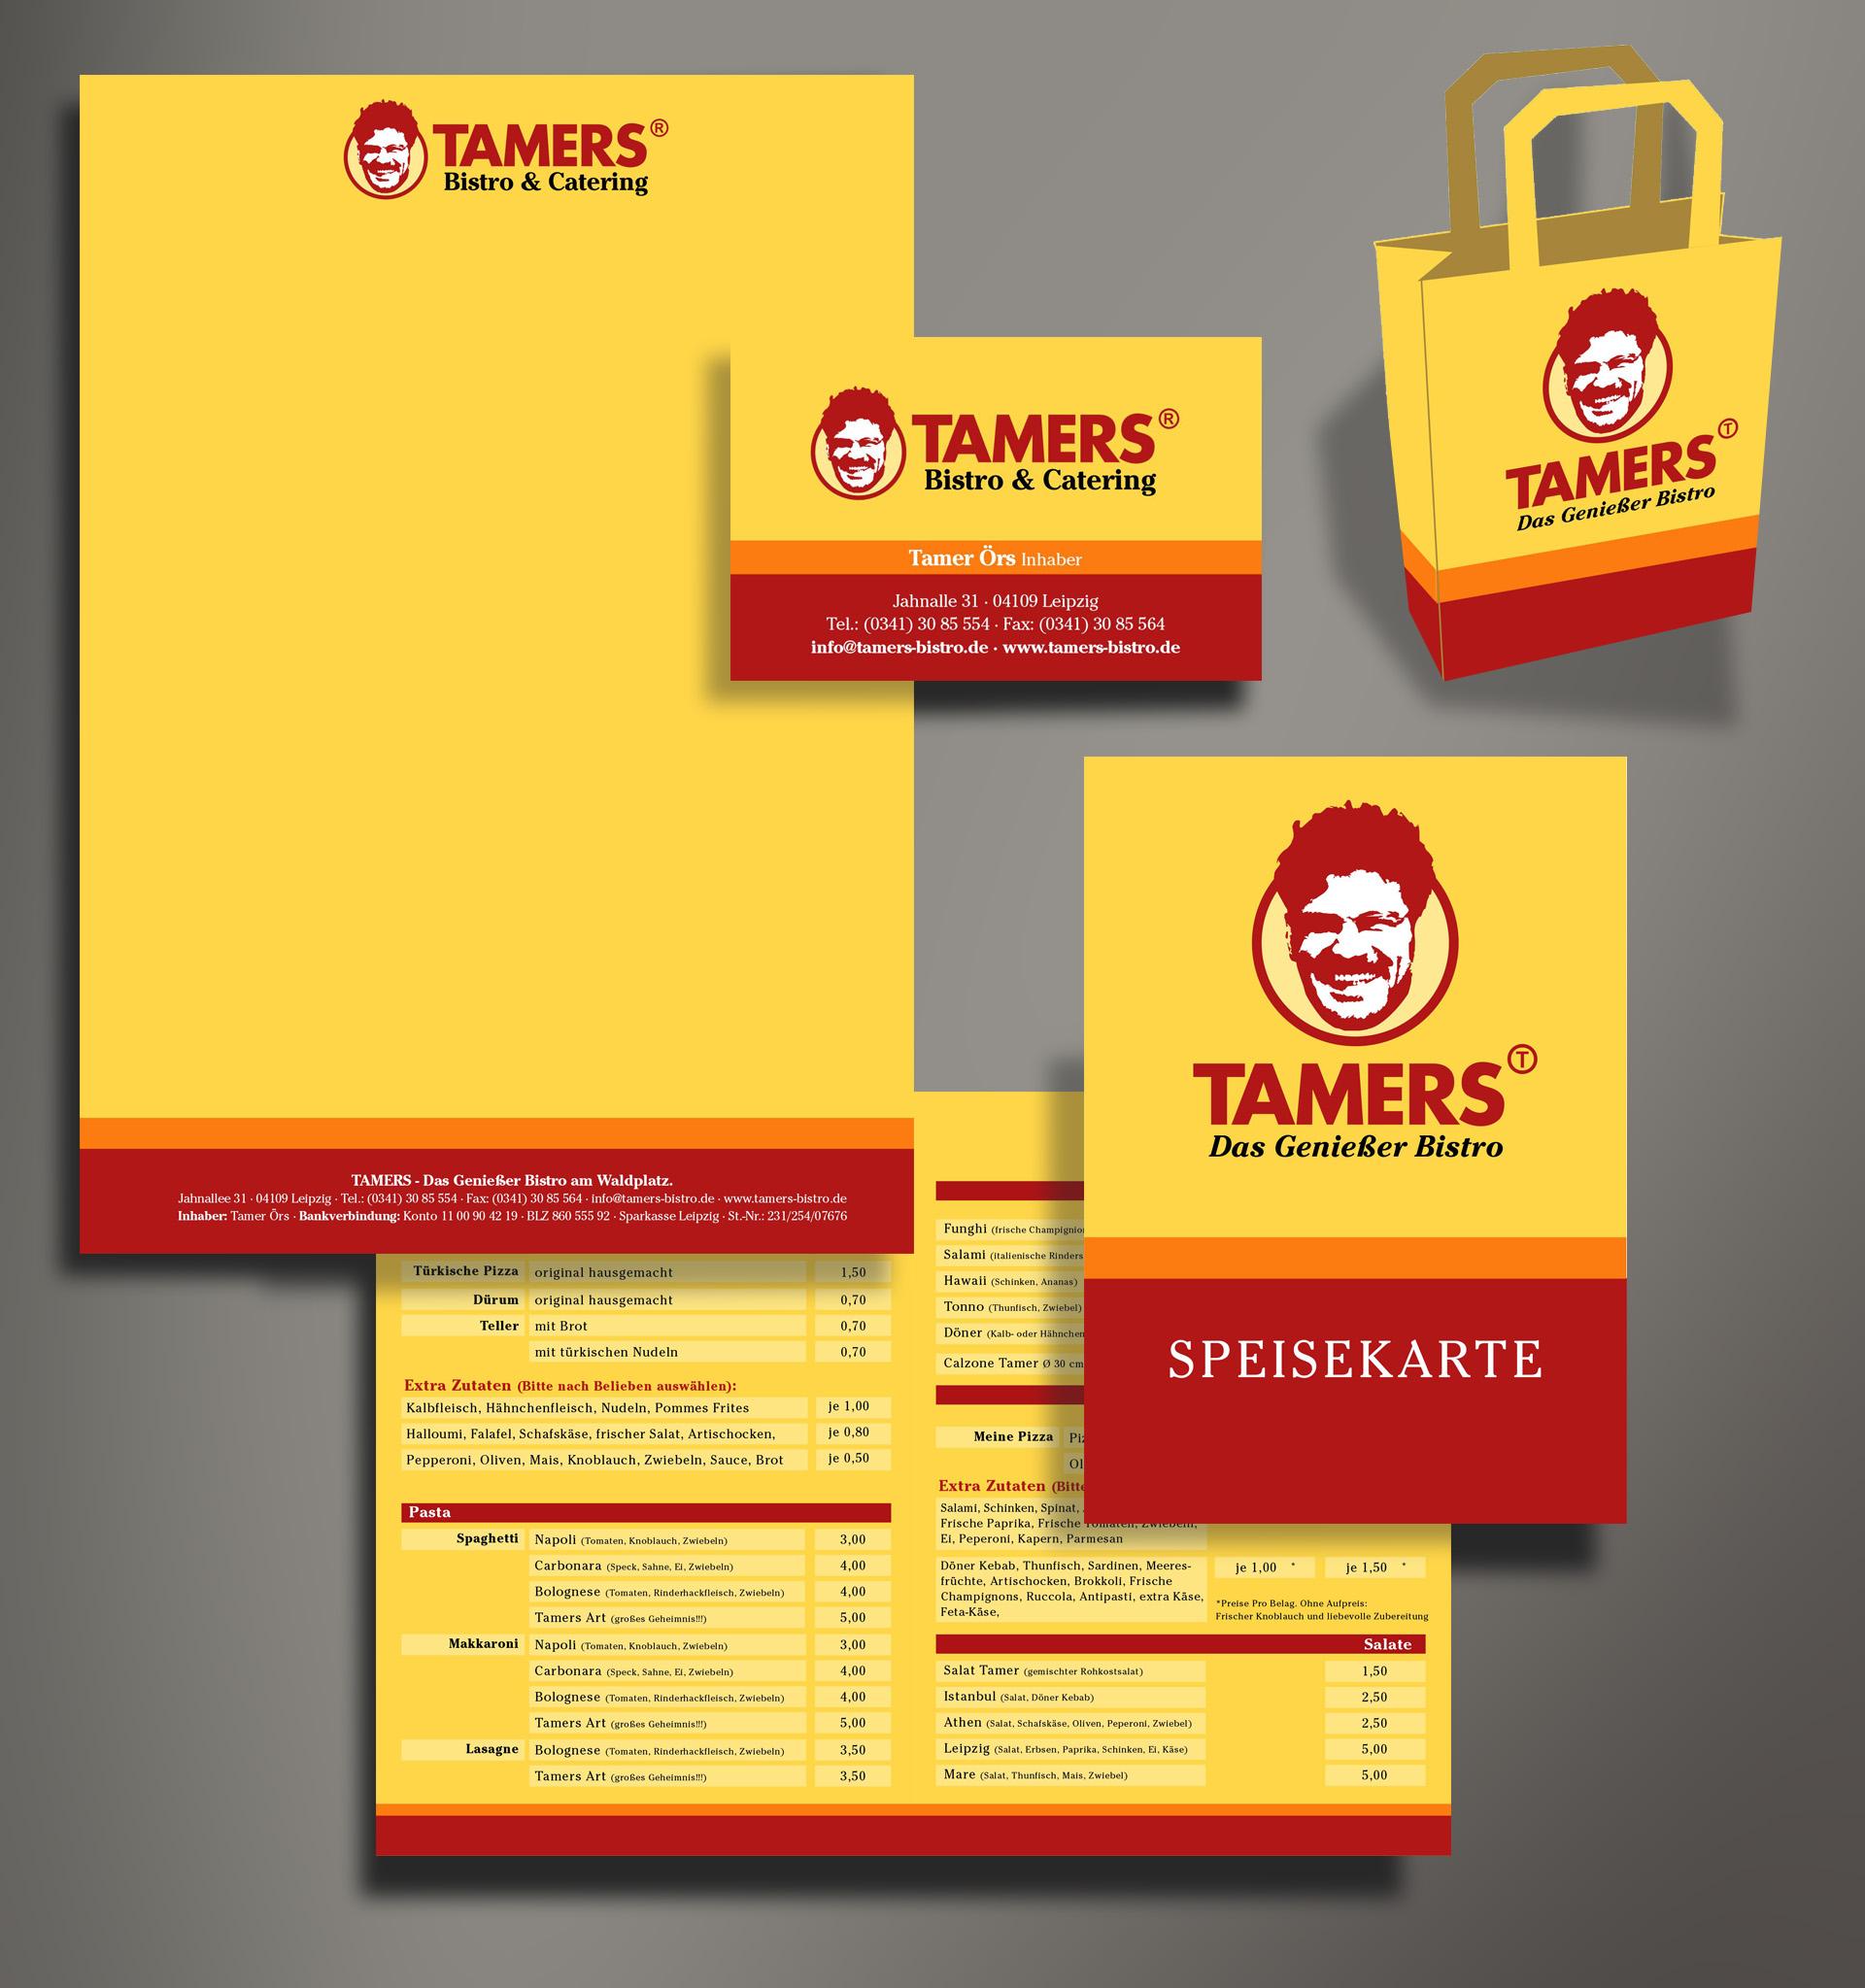 TAMERS Corporate Design Reichelt